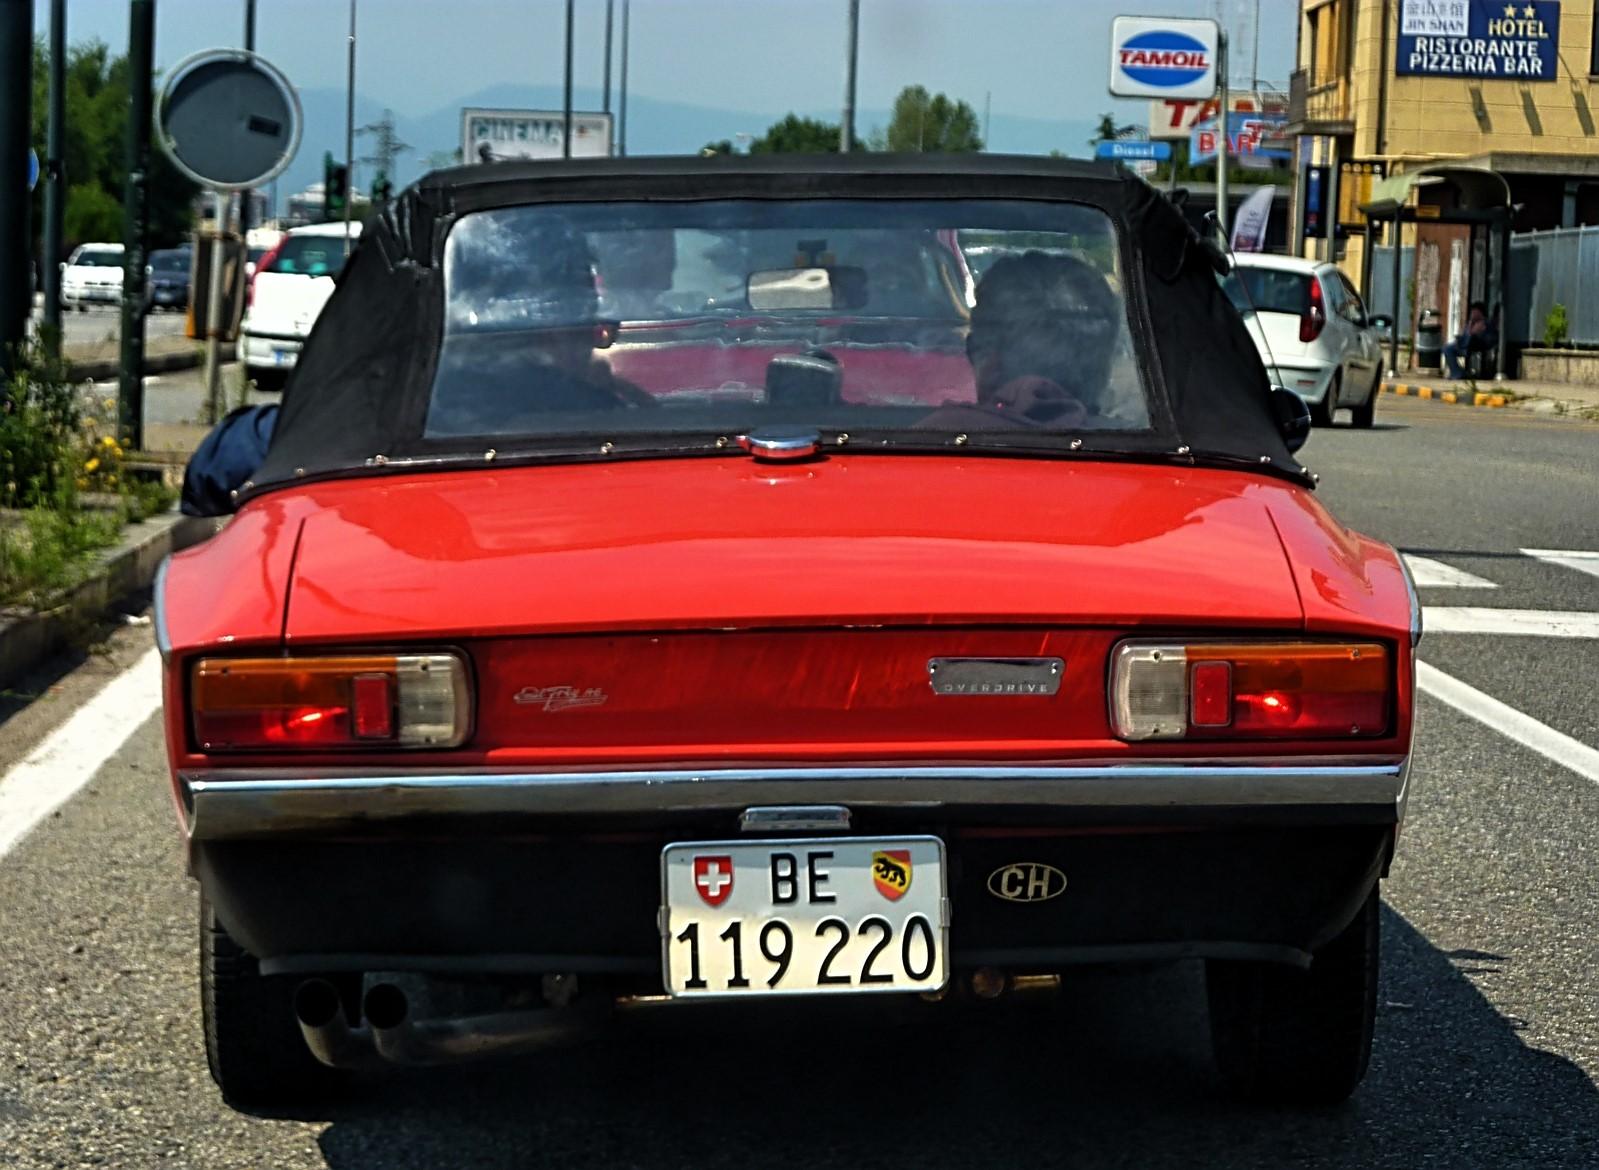 1968 Michelotti TR5 Ginevra Prototype (9)